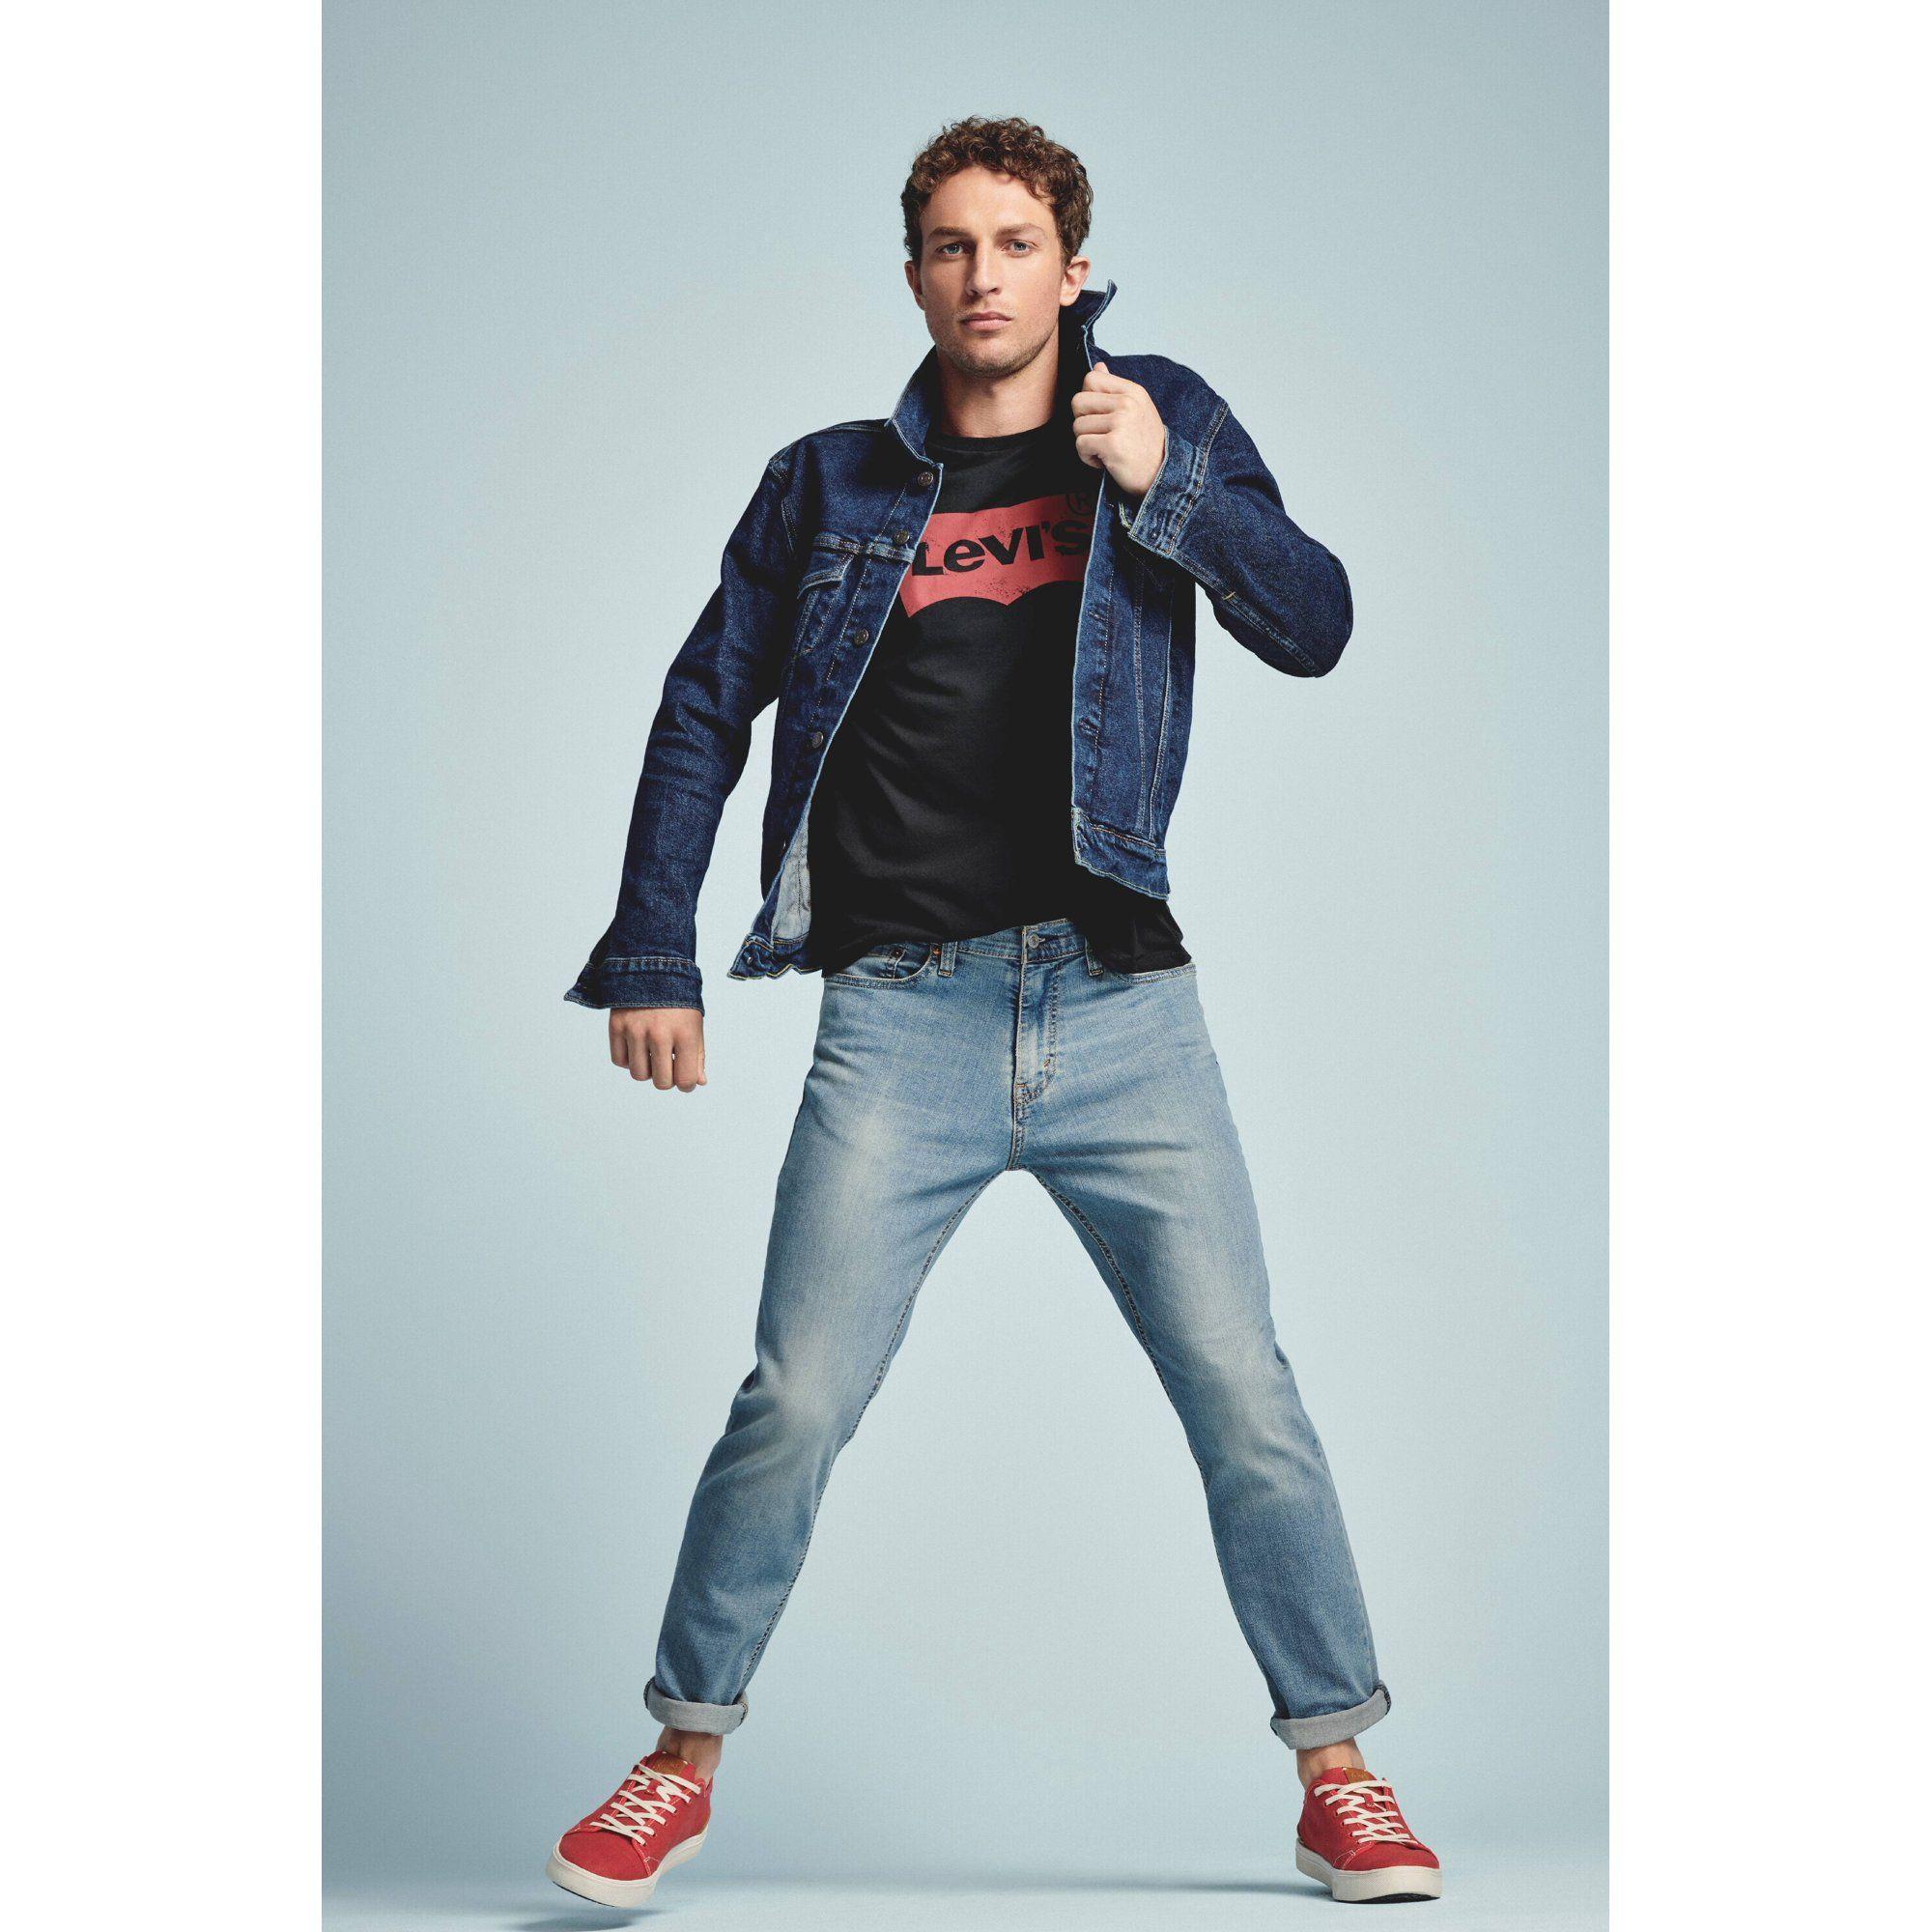 Levi S Levi S Men S Denim Trucker Jacket Walmart Com In 2020 Trucker Jacket Mens Denim Levi [ 2000 x 2000 Pixel ]